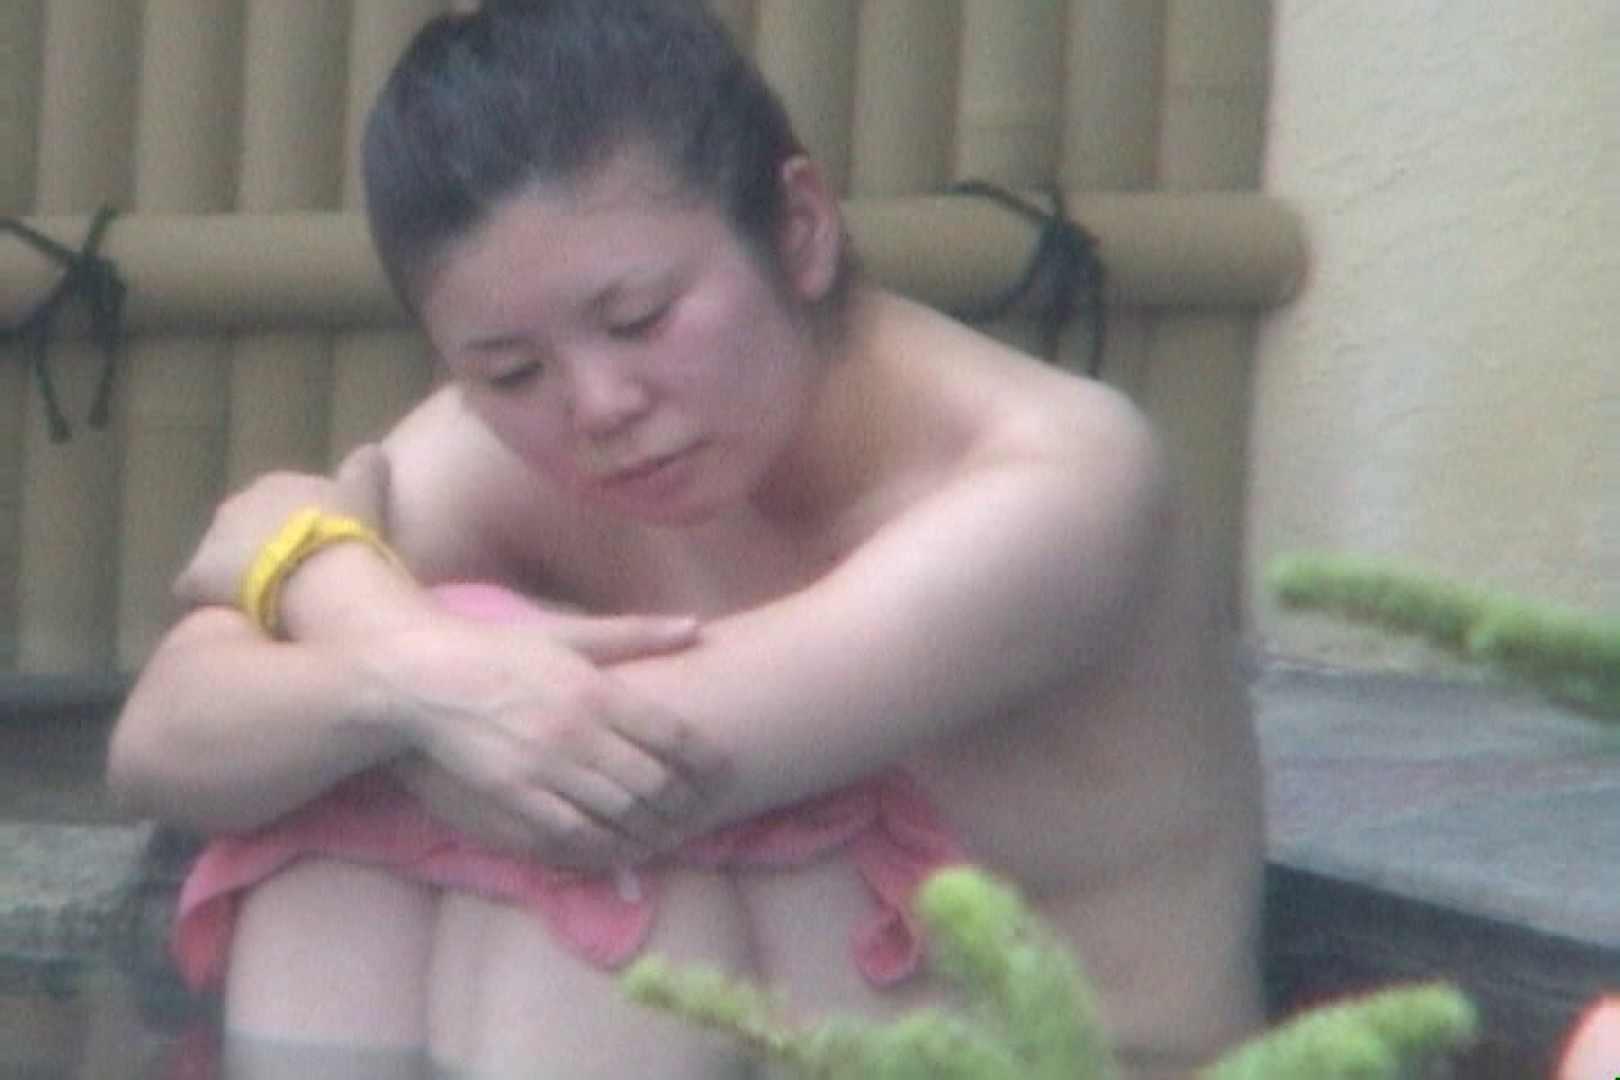 Aquaな露天風呂Vol.47【VIP限定】 盗撮   OLのエロ生活  101連発 16